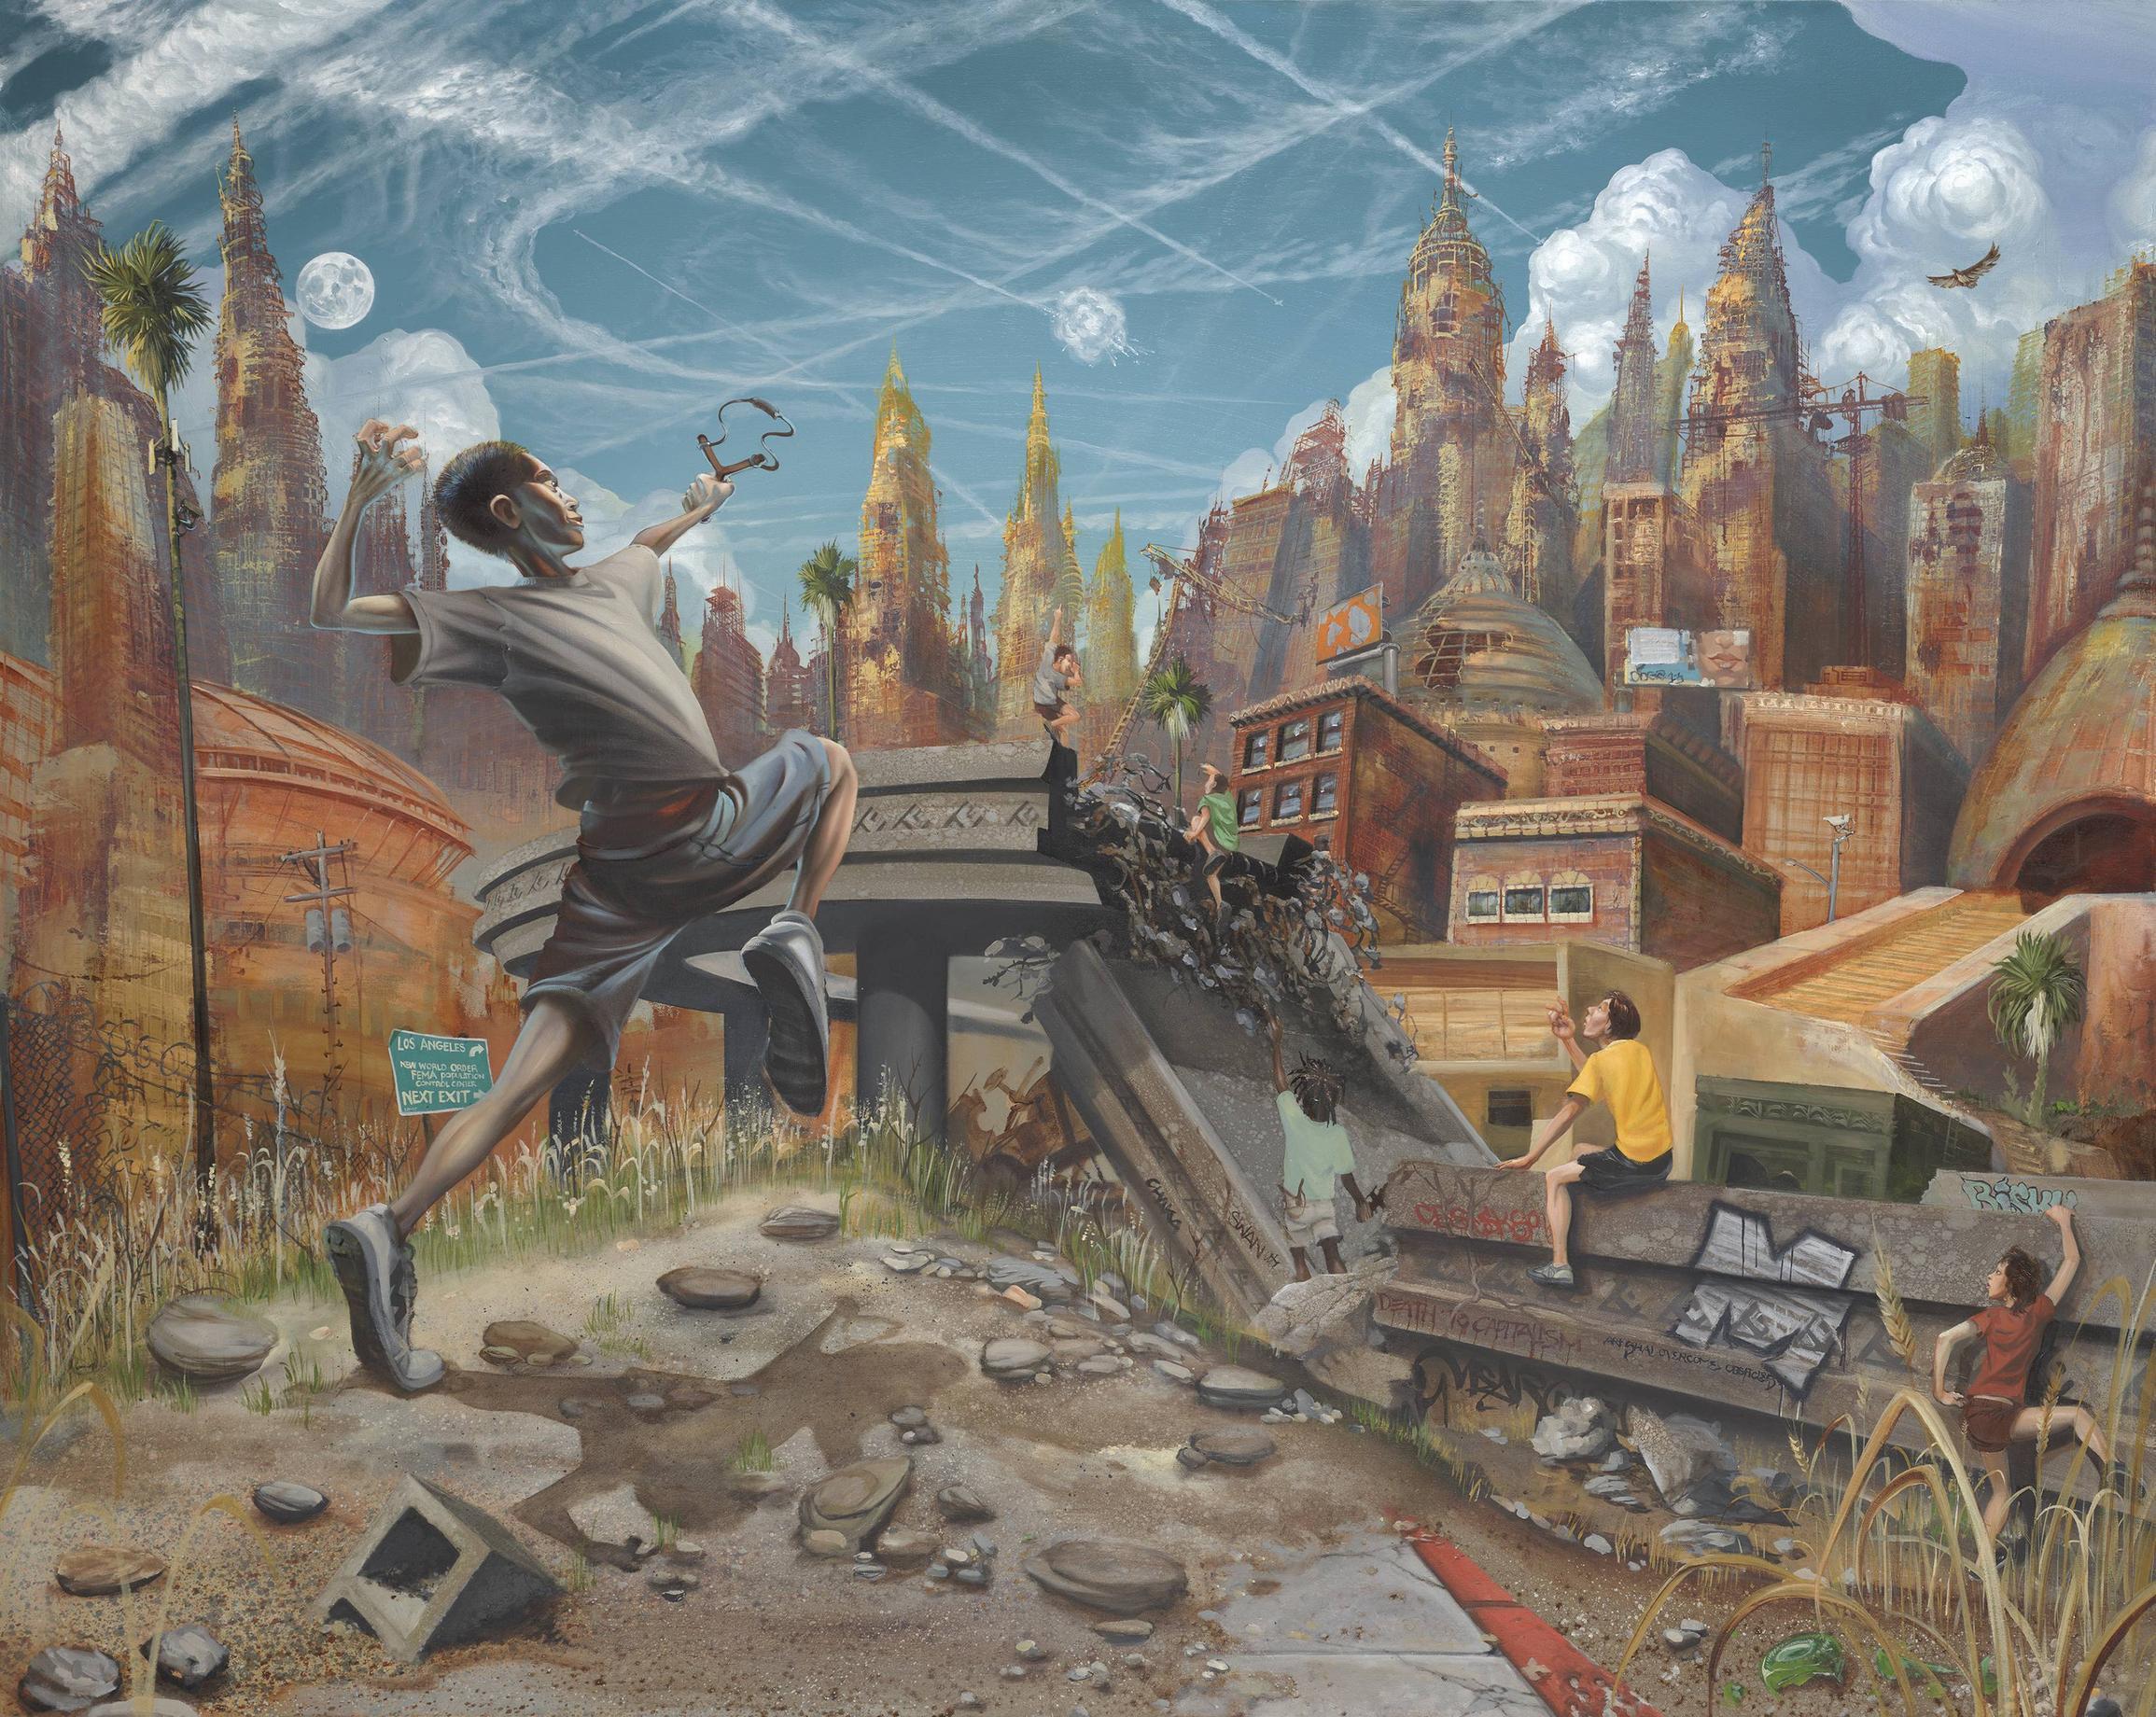 Freeport - David & Goliath 59/100